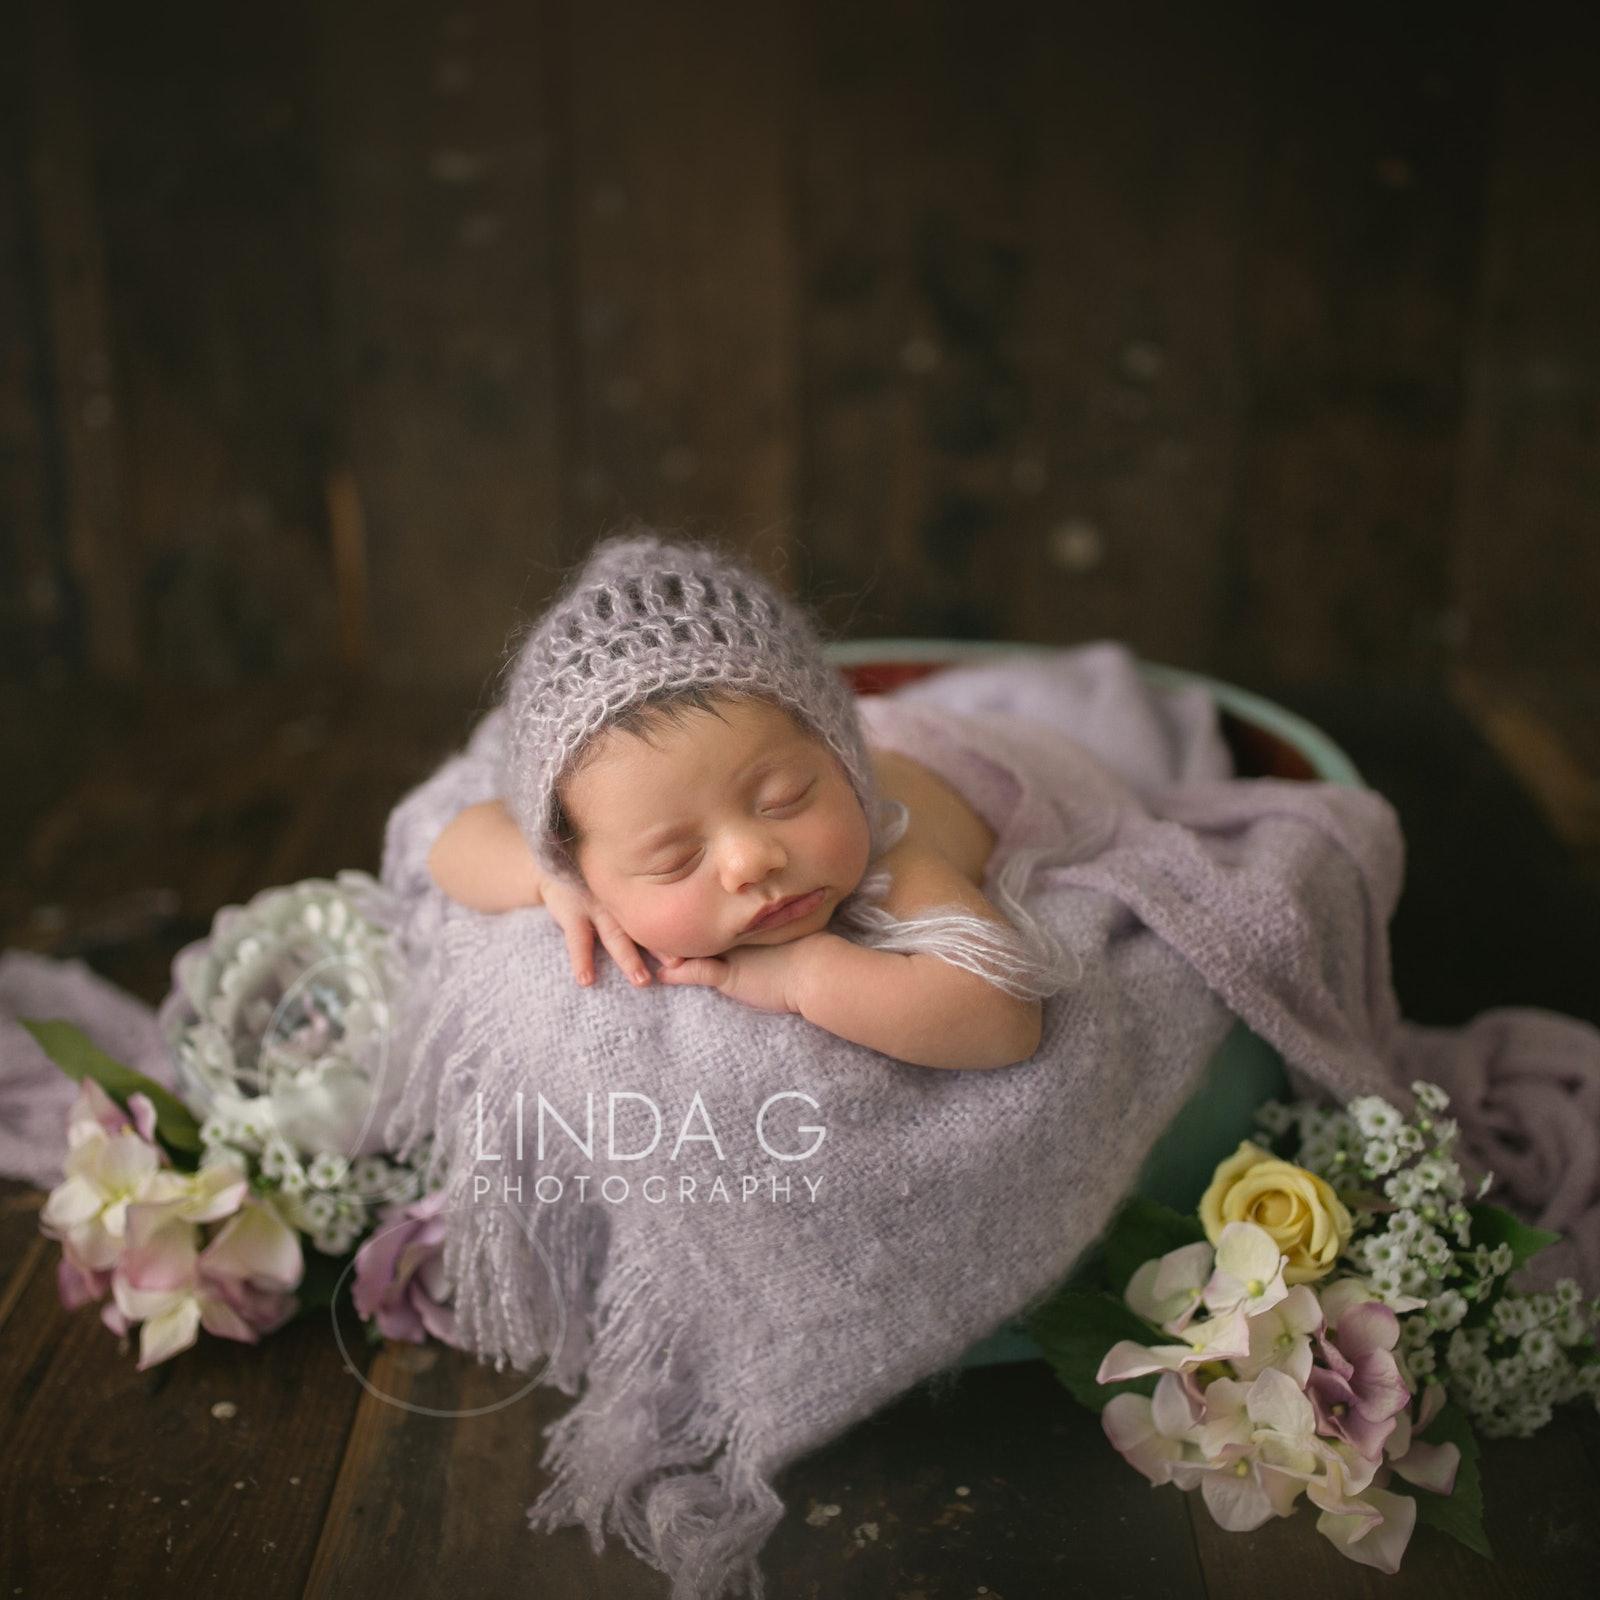 award winning sydney inner west newborn photographer